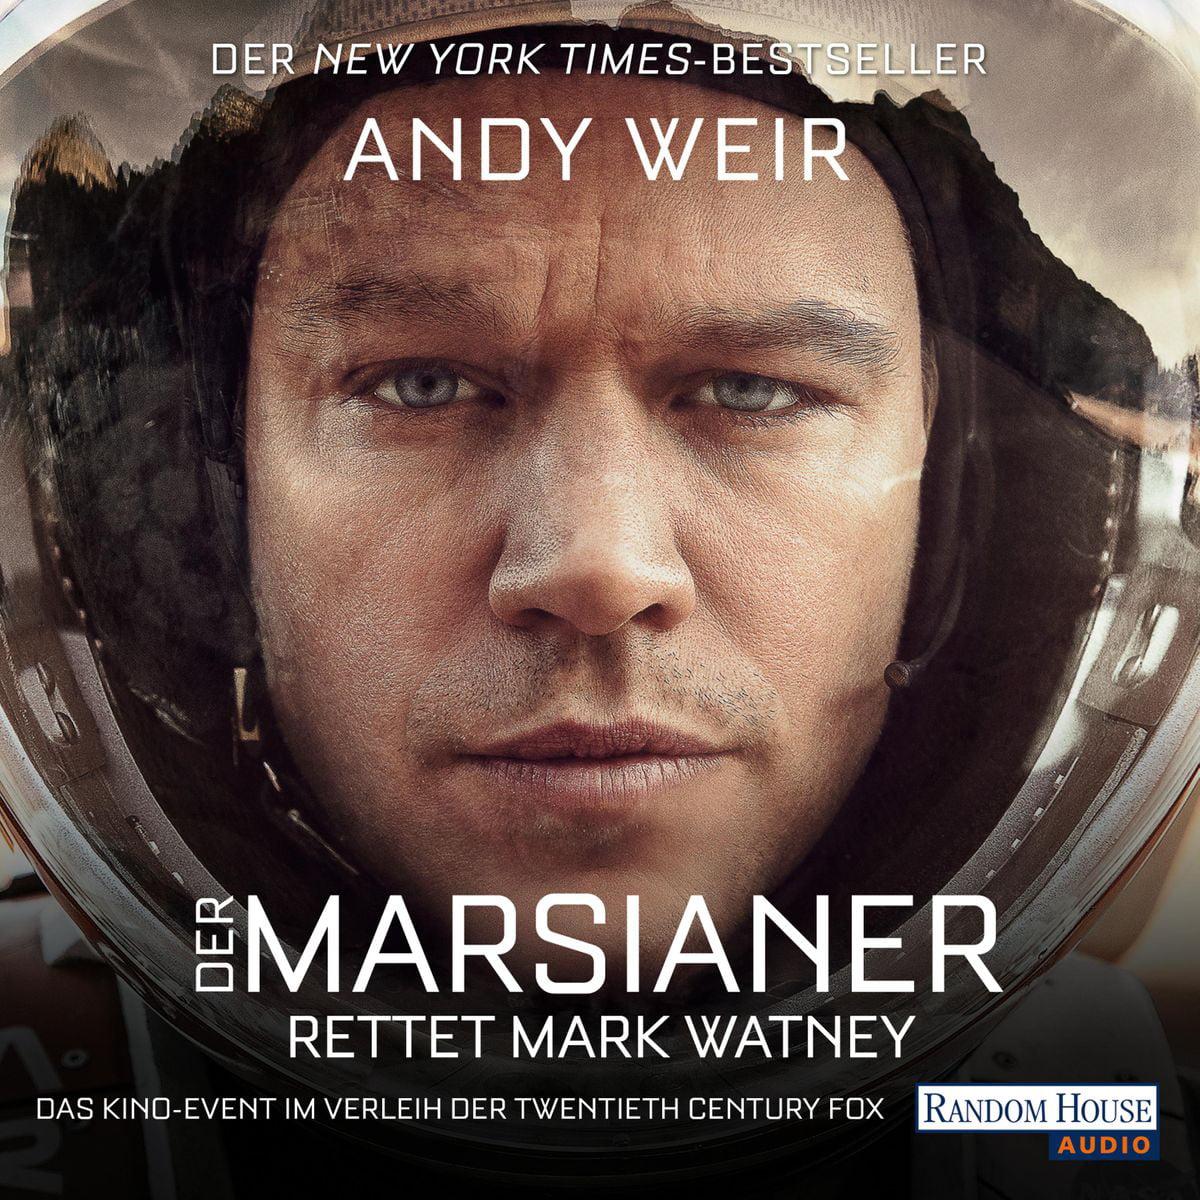 Soundtrack Marsianer